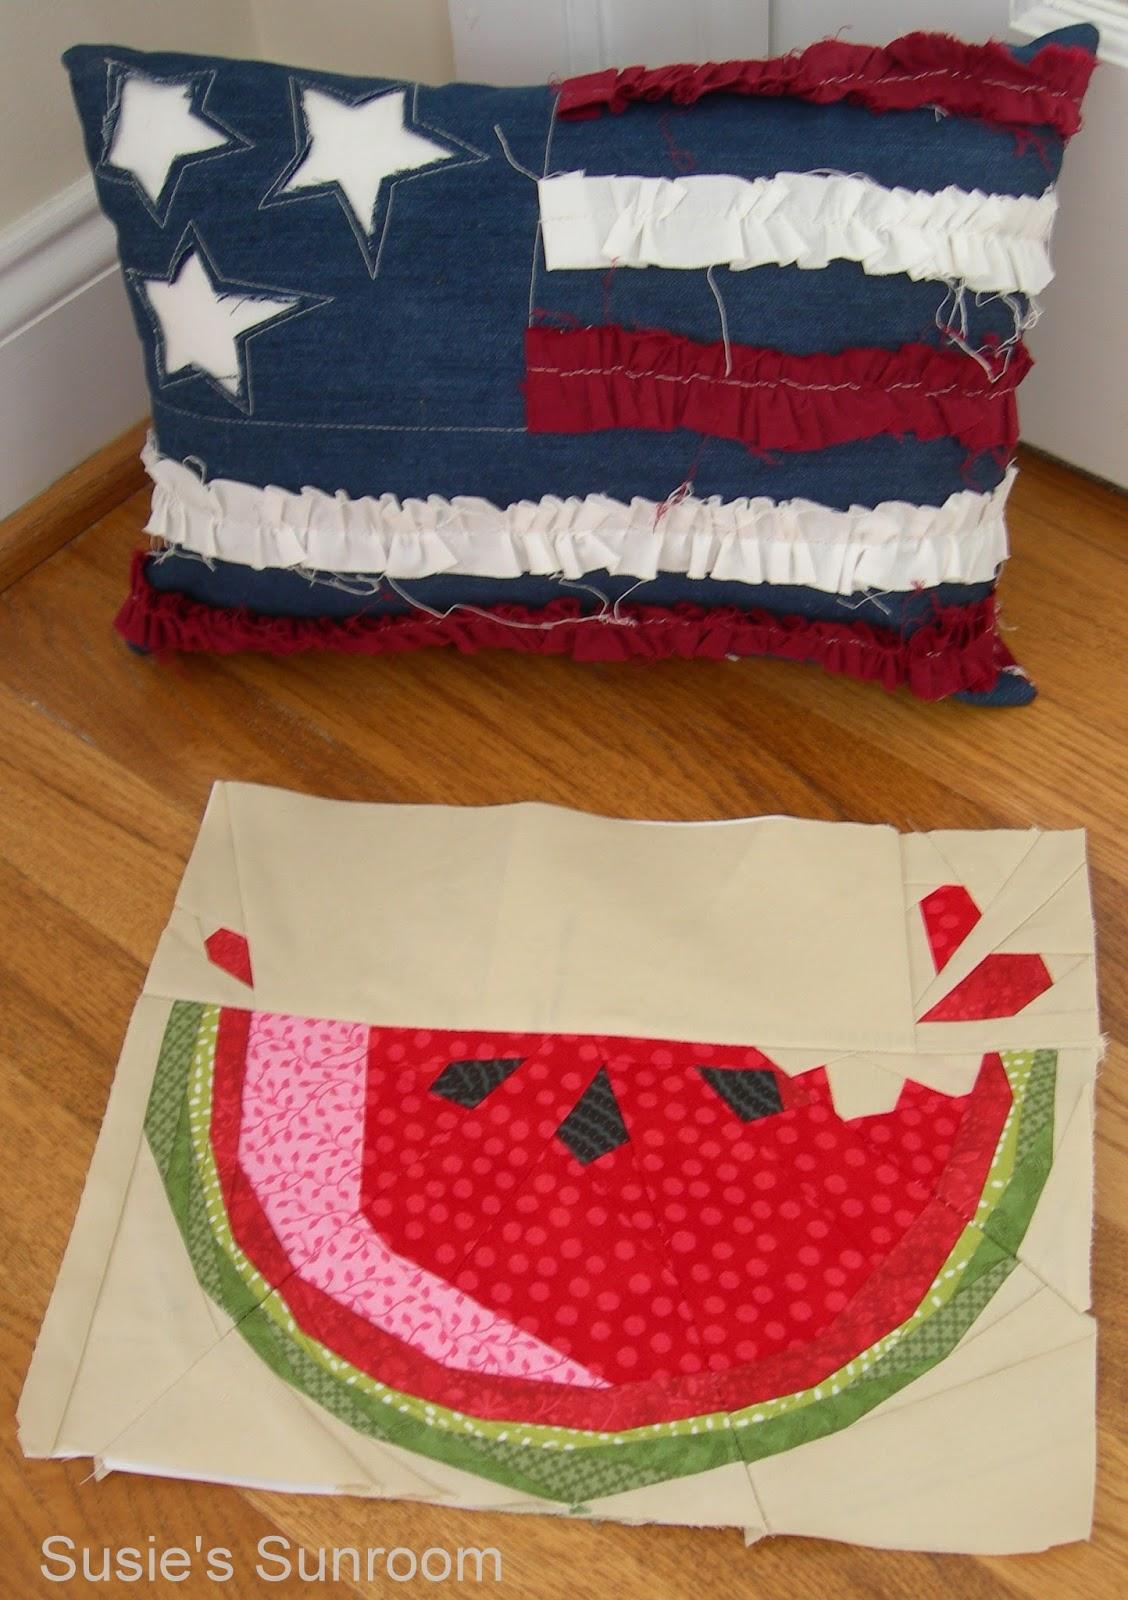 Susie's Sunroom: Watermelon Slice Table Topper : watermelon quilt pattern - Adamdwight.com